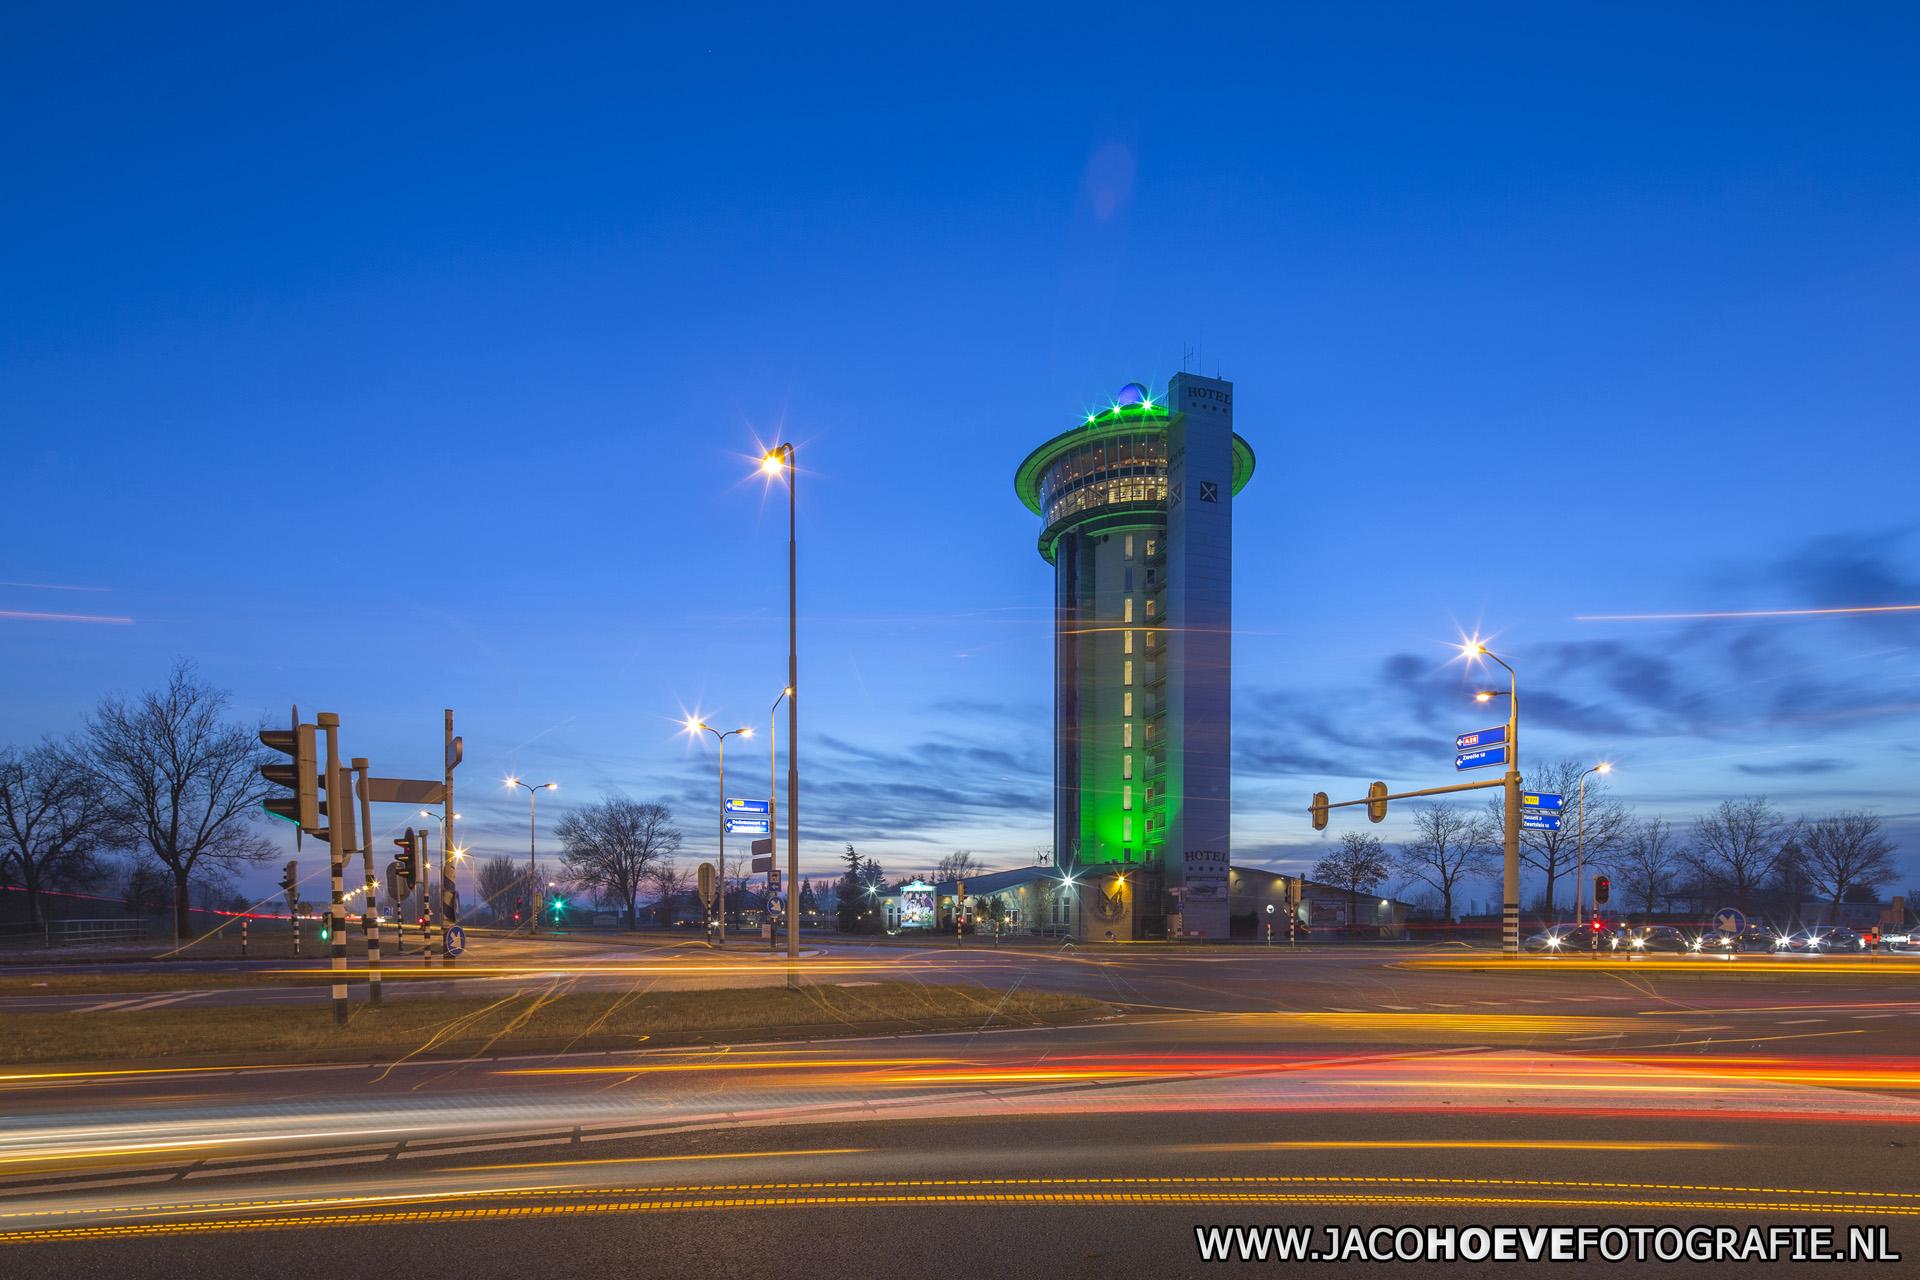 lichtmis-jacohoevefotografie-002